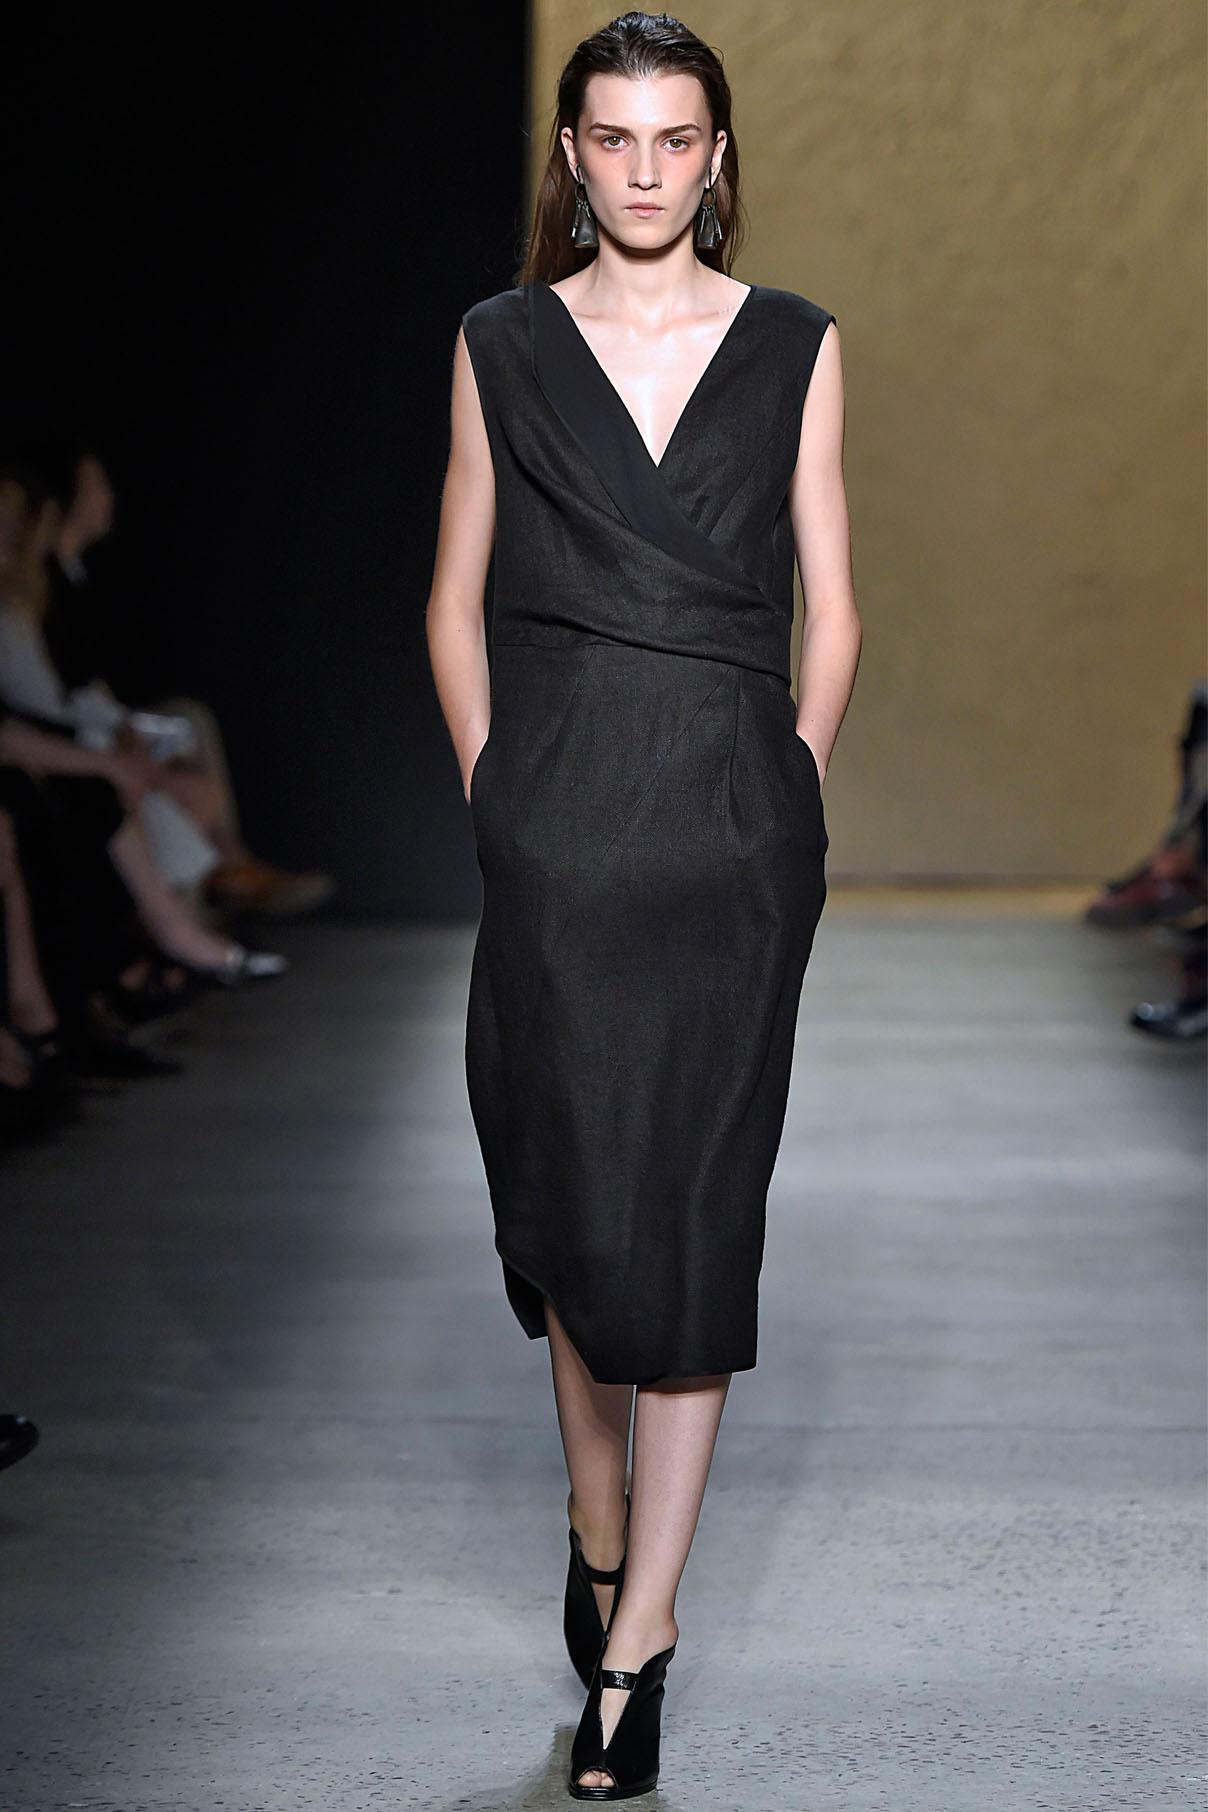 Look 30 Onyx bonded linen tweed/silk chiffon drape dress.